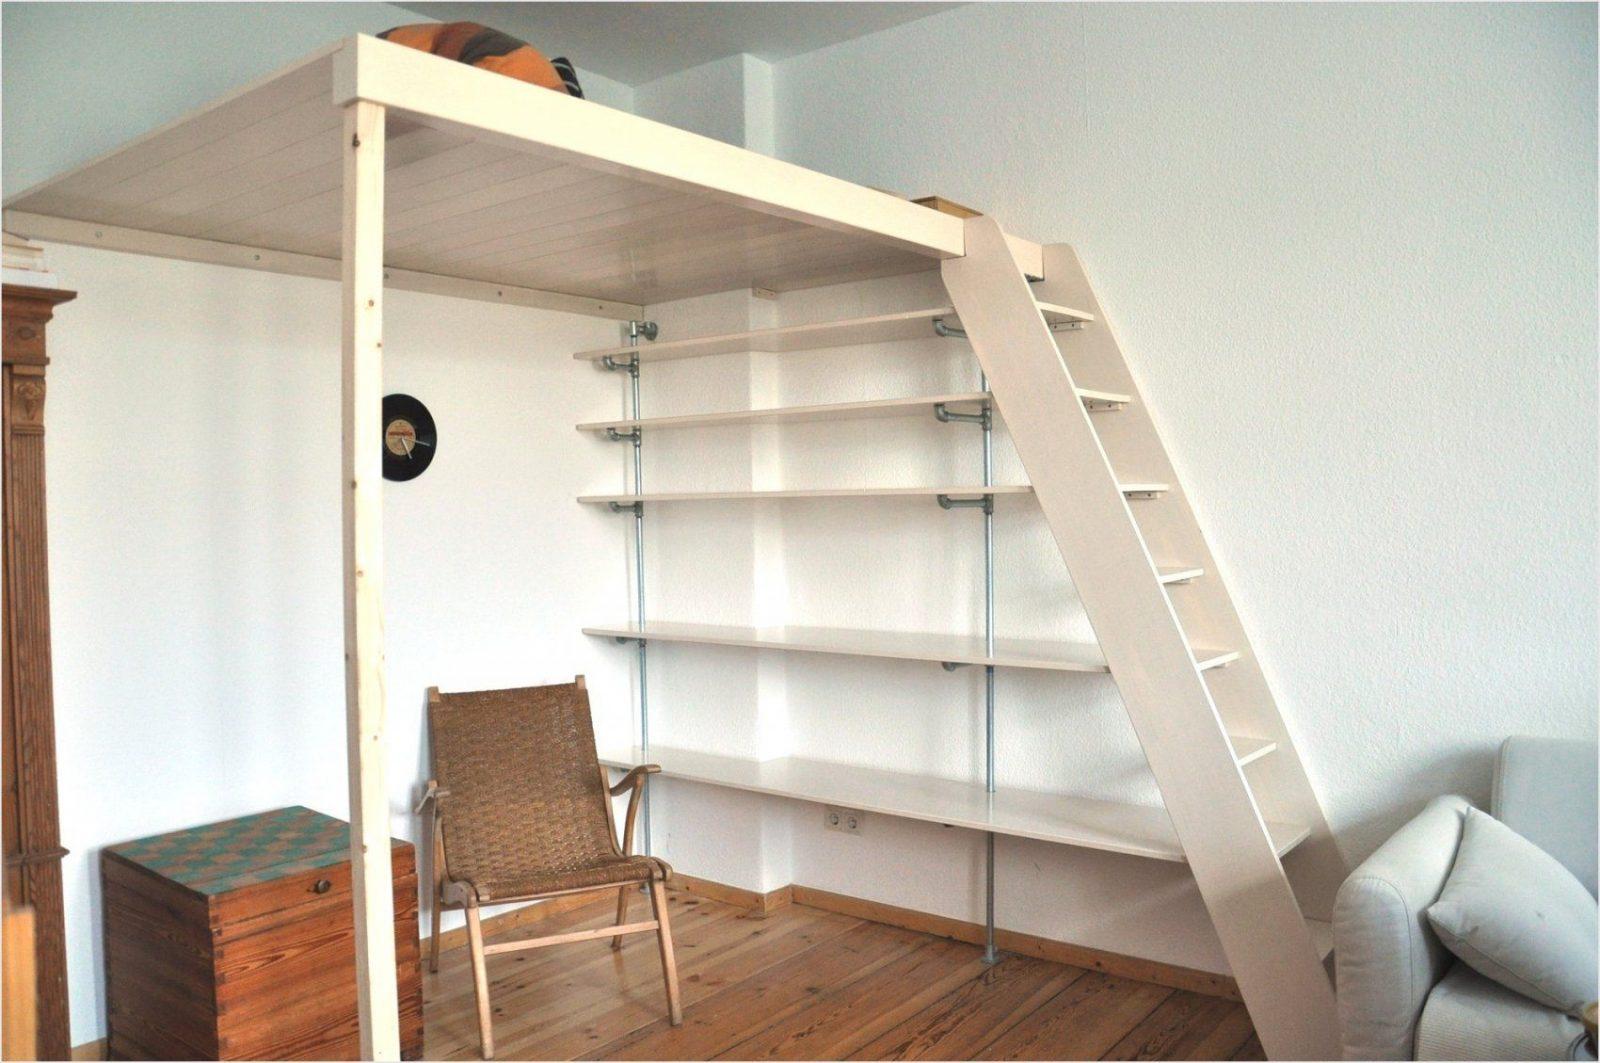 hochbett selber bauen kreativ, stockbett selber bauen wunderbar kreativ hochbett aus holz selber, Design ideen